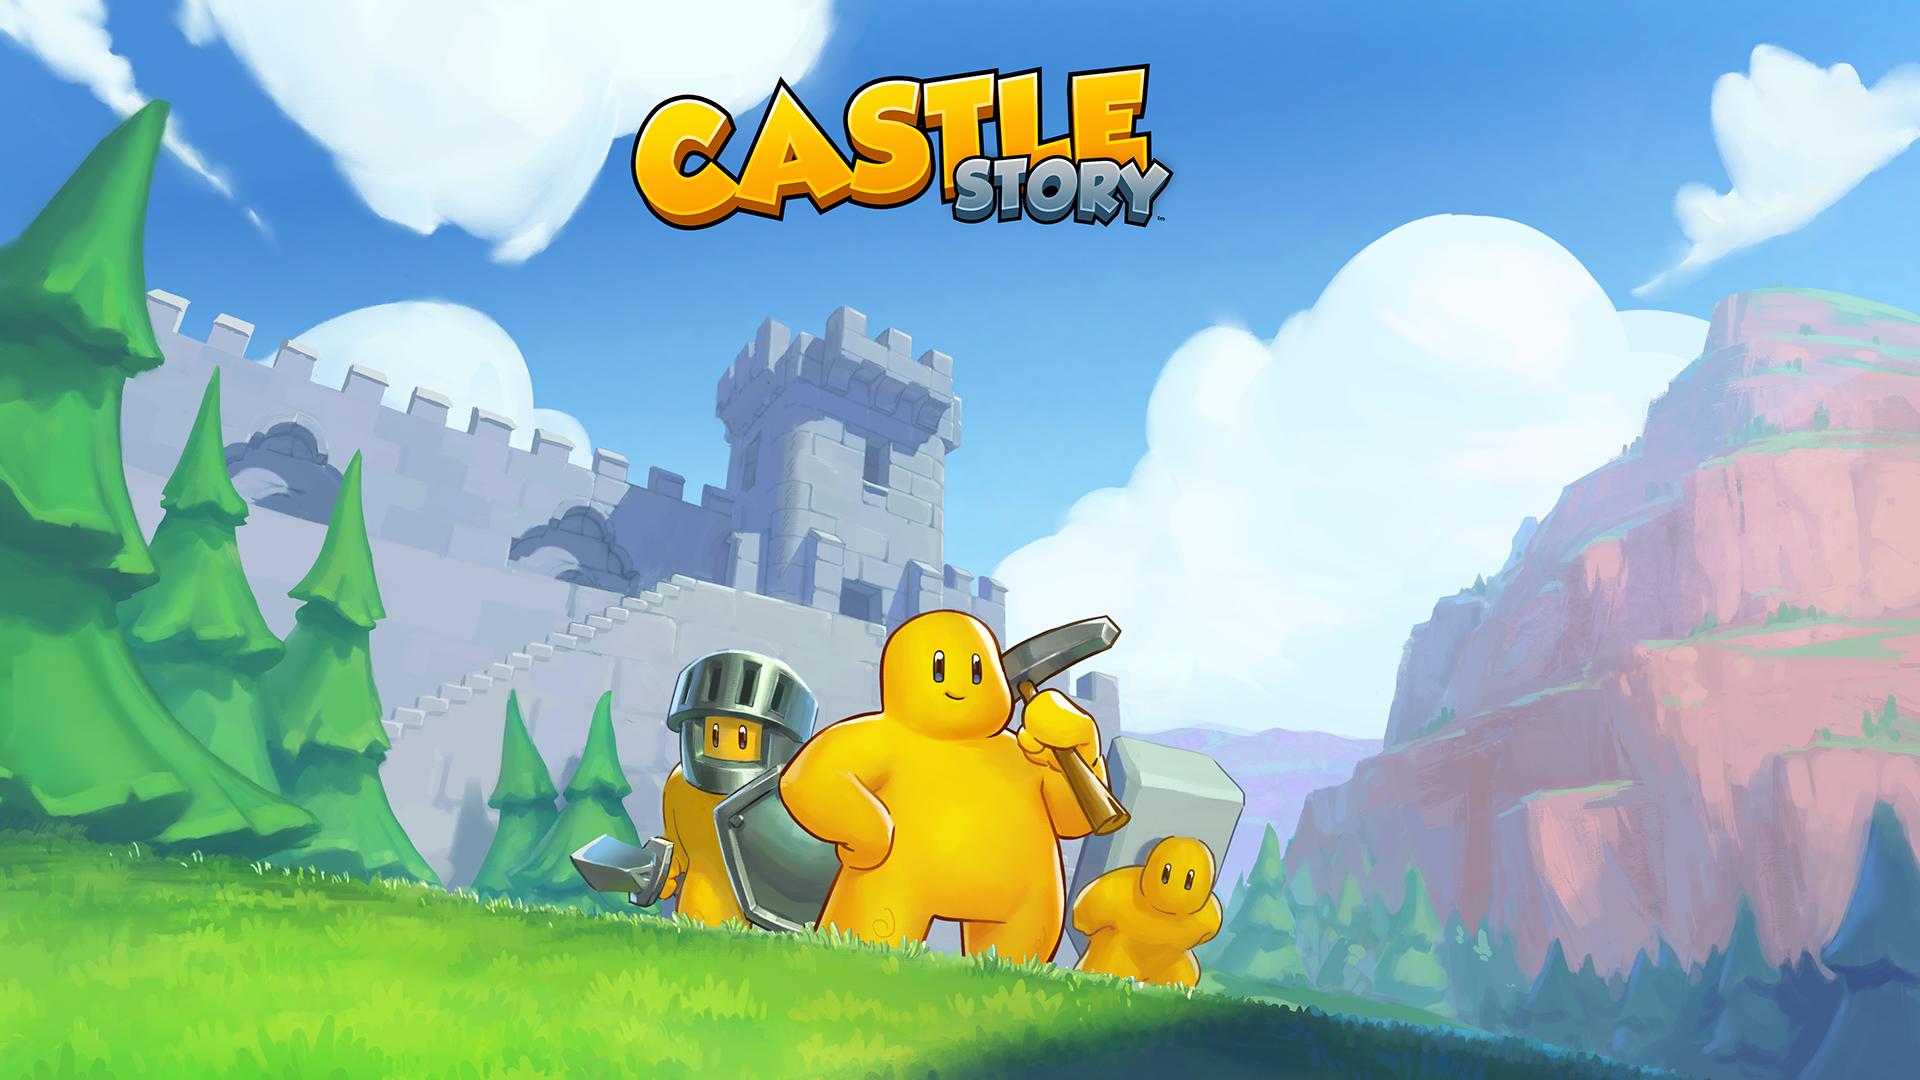 Castle Story Marketing Art